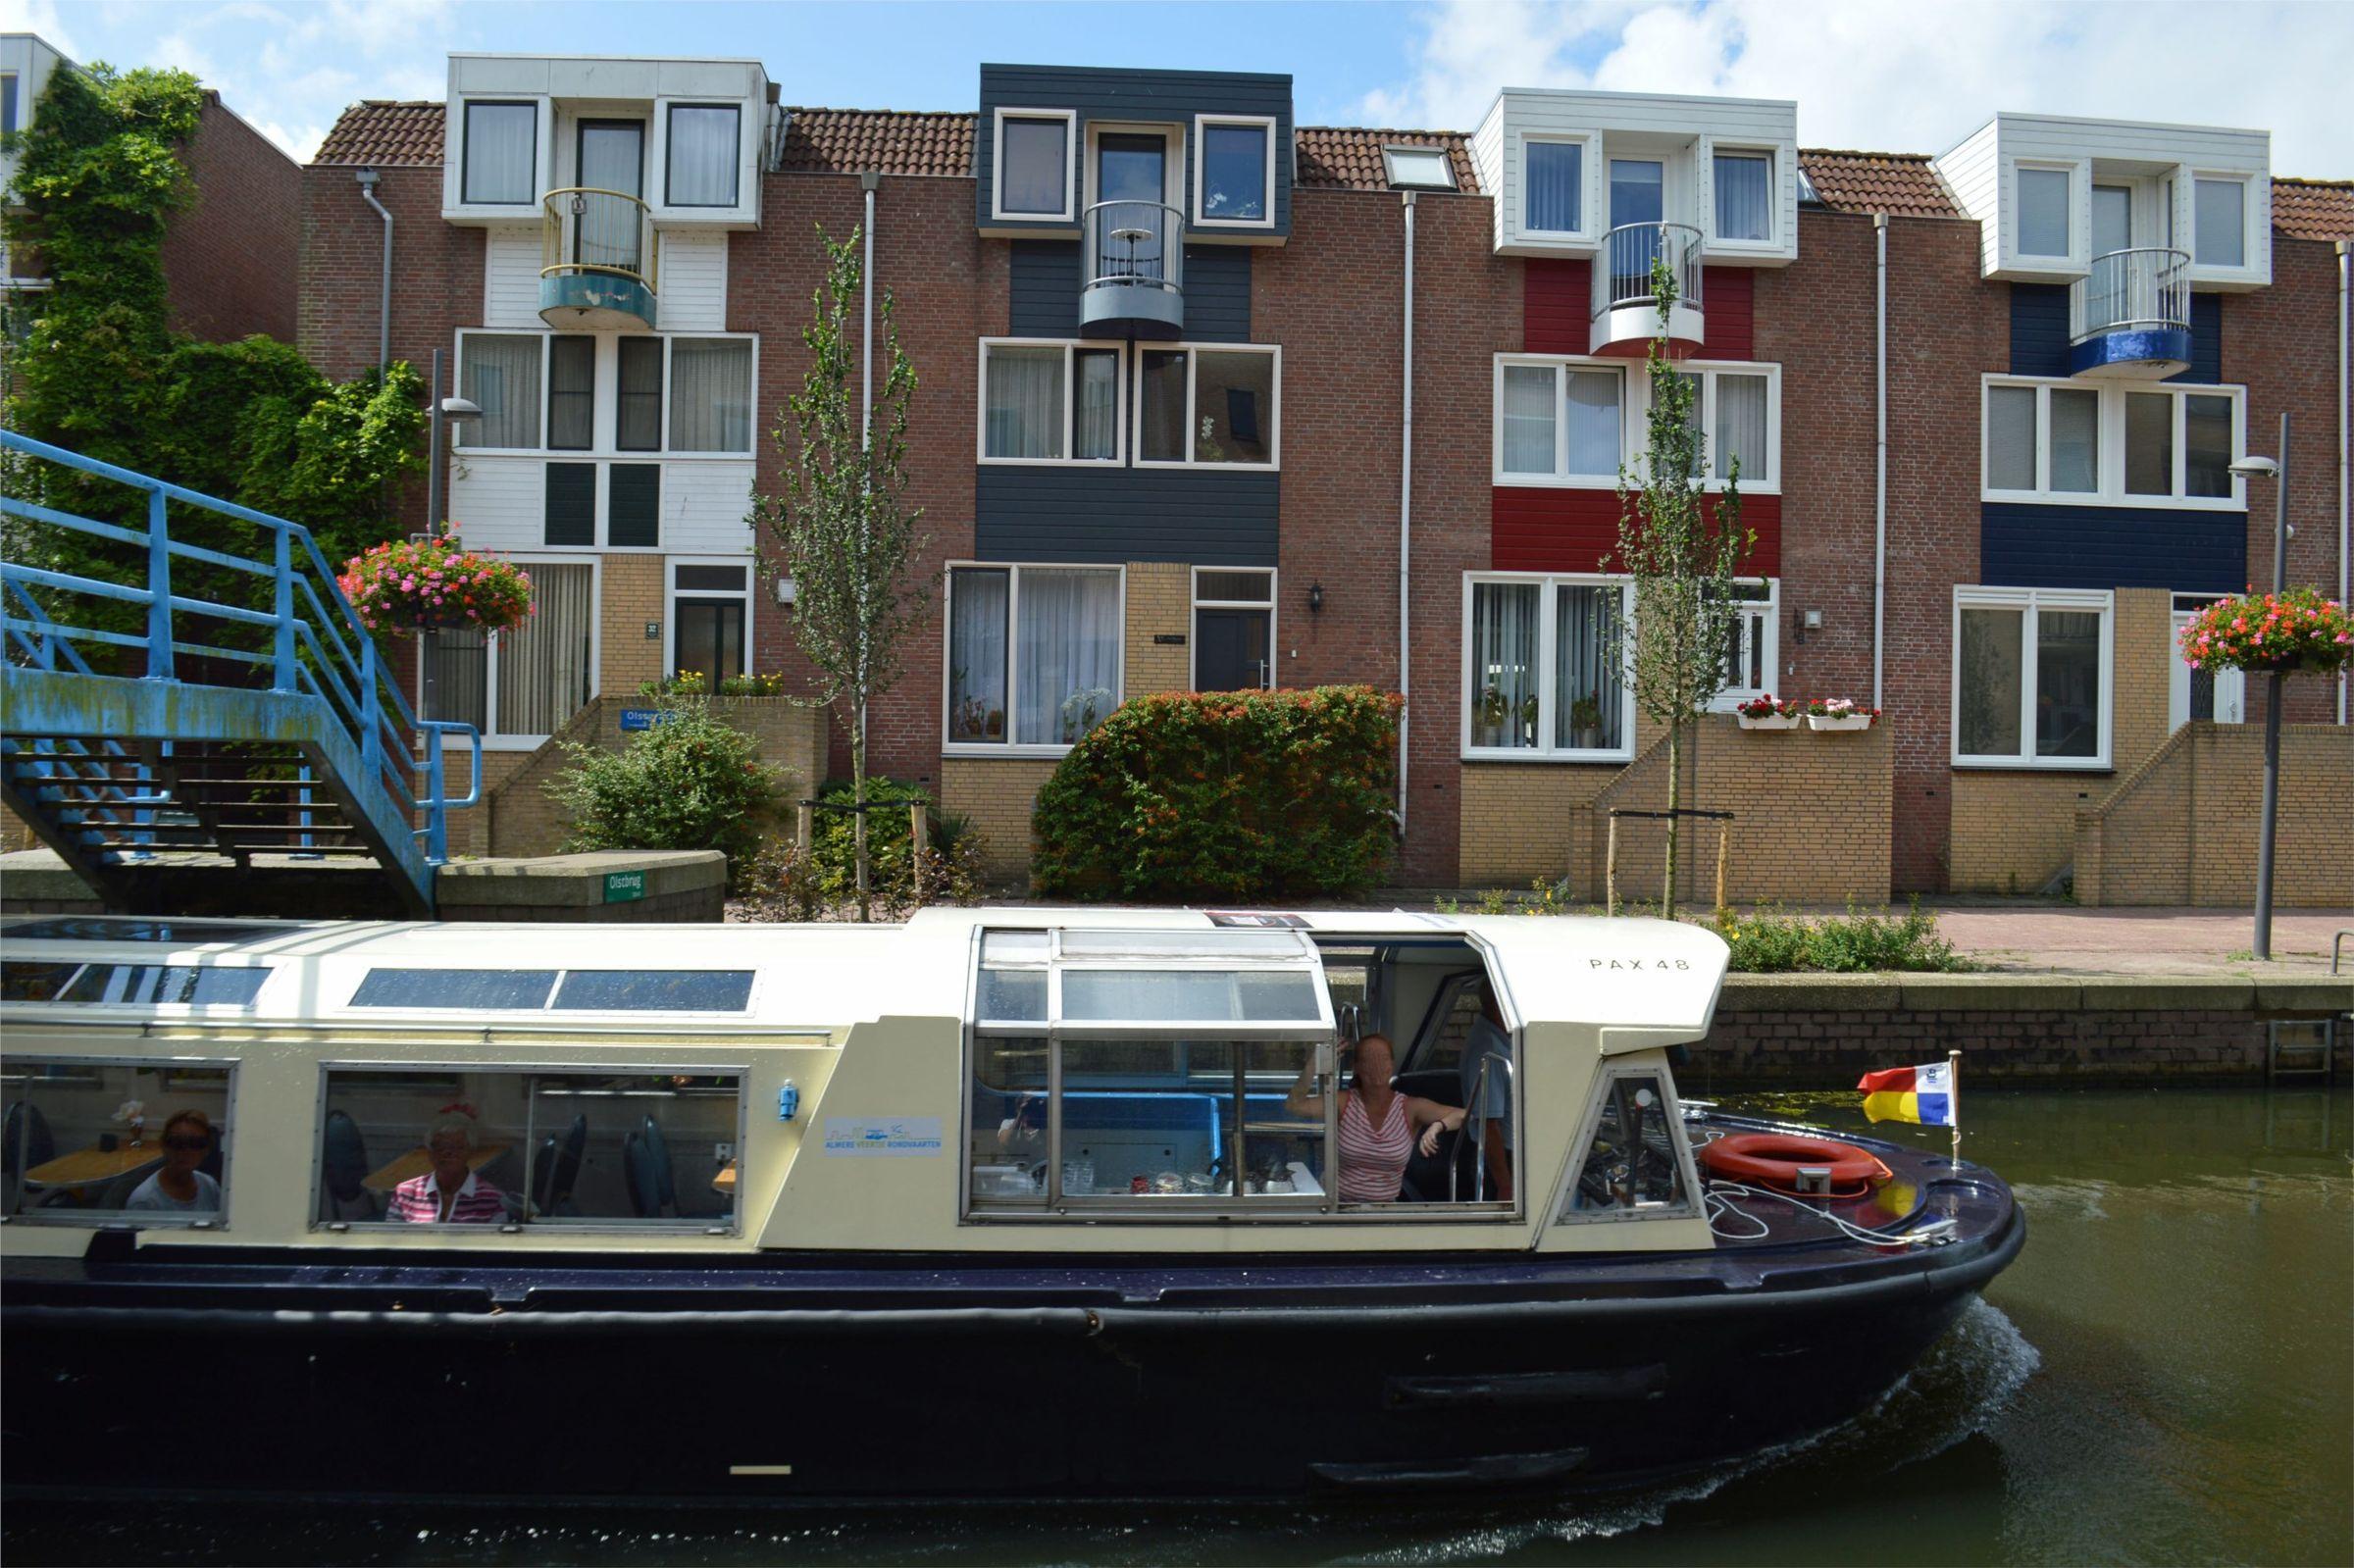 Olstgracht 30, Almere